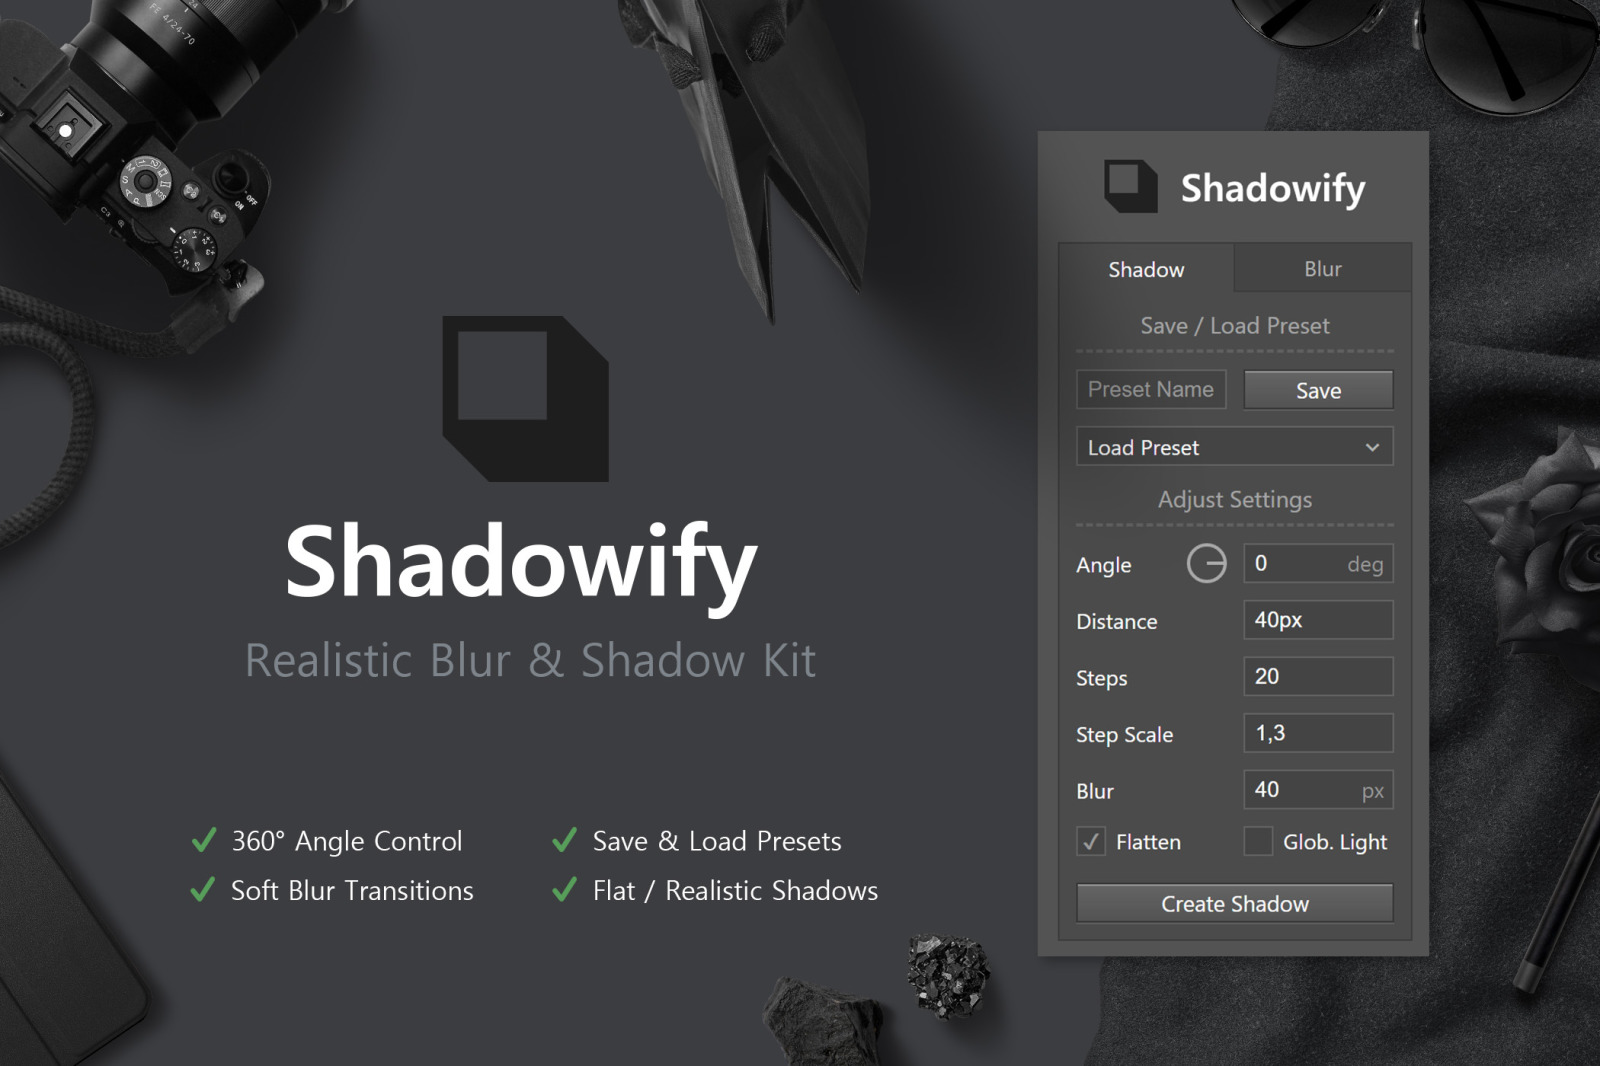 Shadowify - Realistic Blur & Shadow Kit